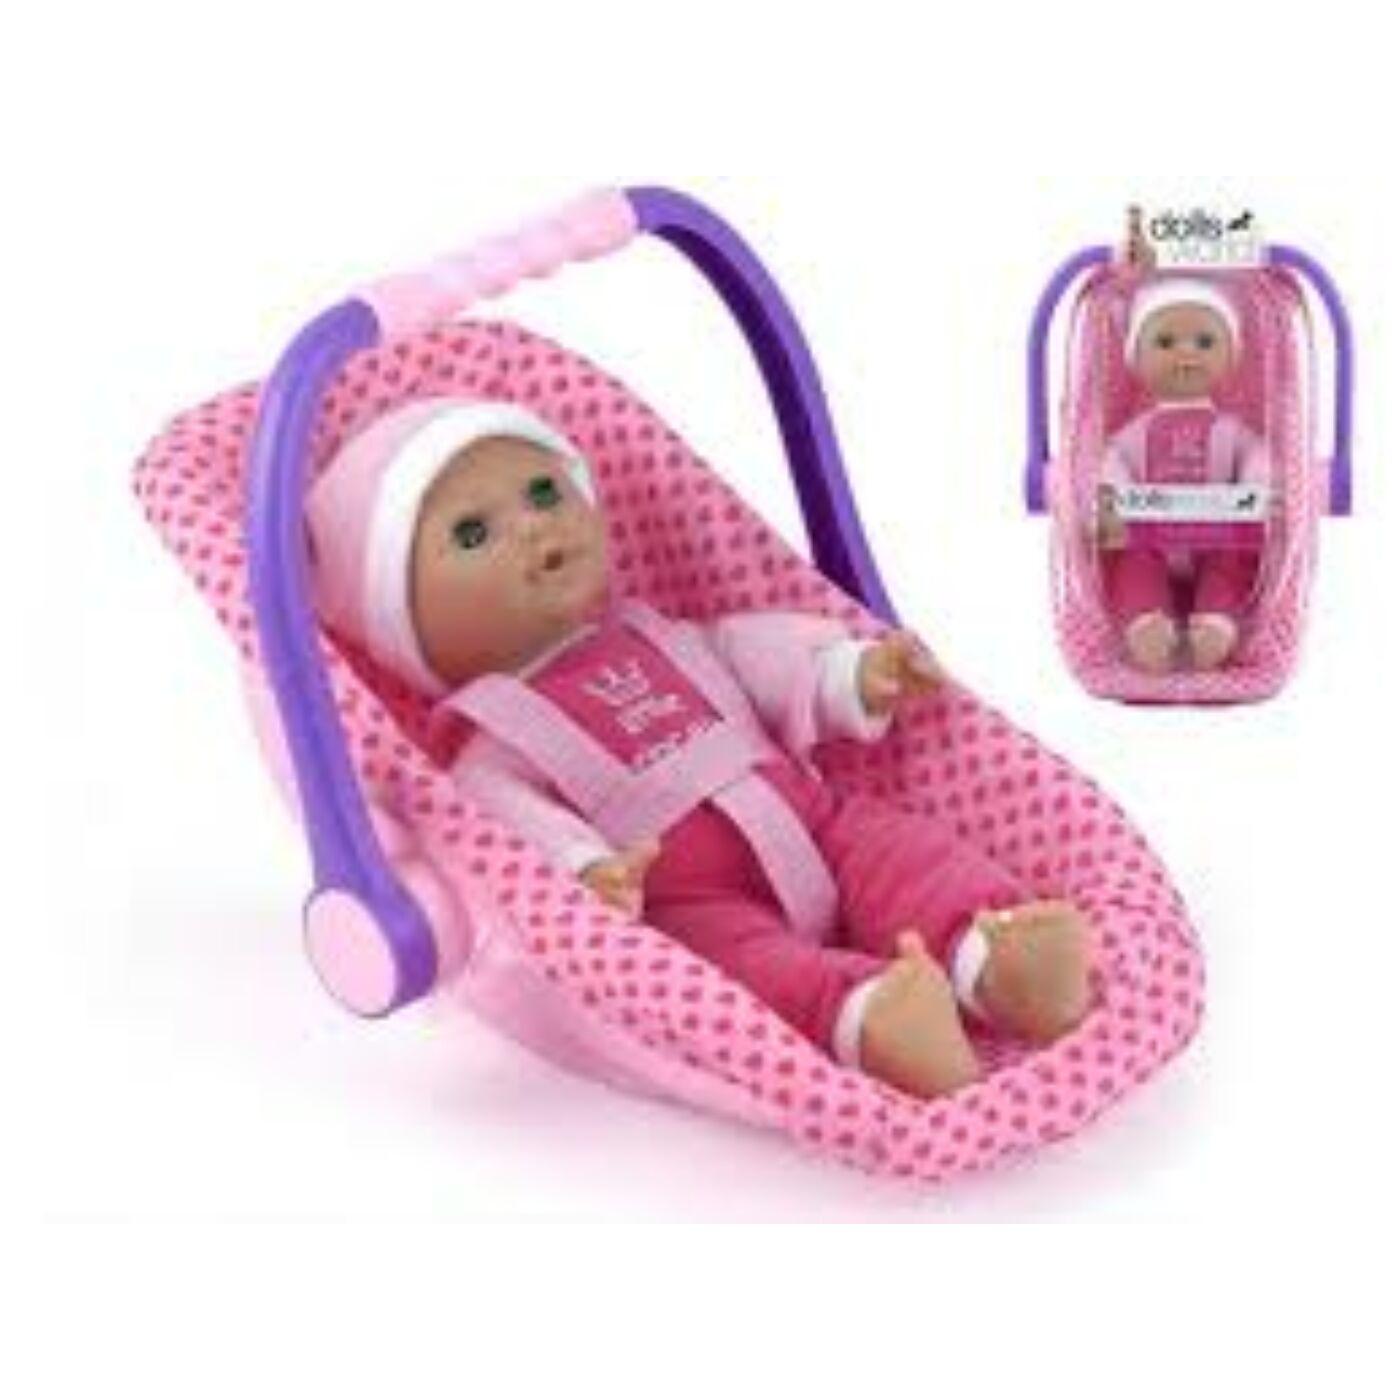 Isabella baba hordozóval